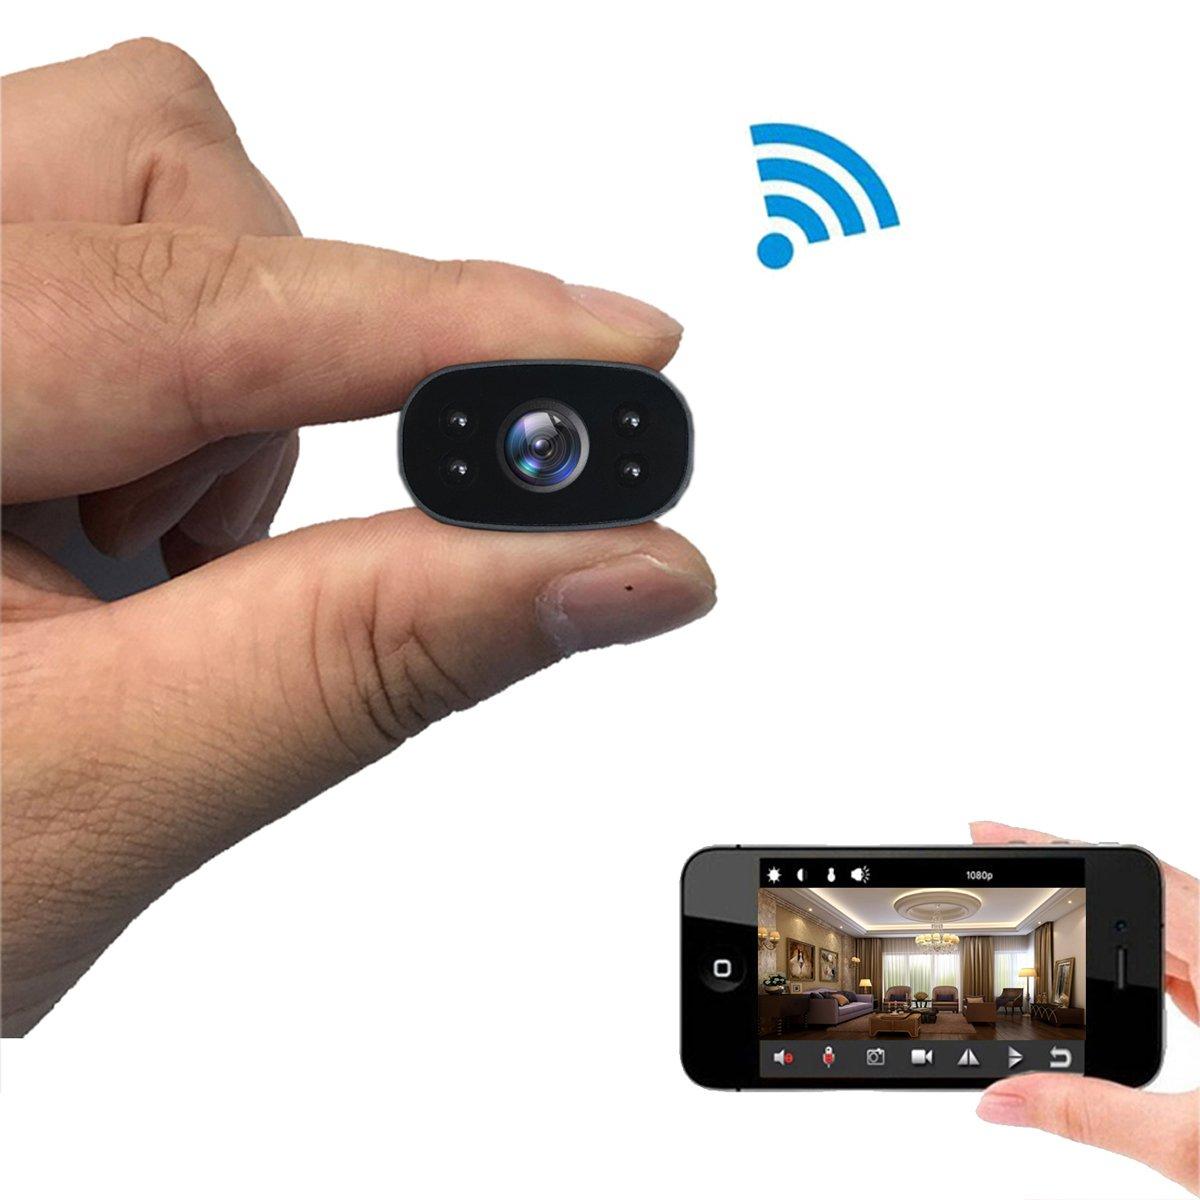 PNZEO W3 Mini Spy Camera 1080P HD Wireless WiFi Hidden Cameras IR Night-Vision Camera Tiny 140° Wide-View-Angle Video Recorder Surveillance Cameras Remote View Motion-Detection(Night Vision Version)